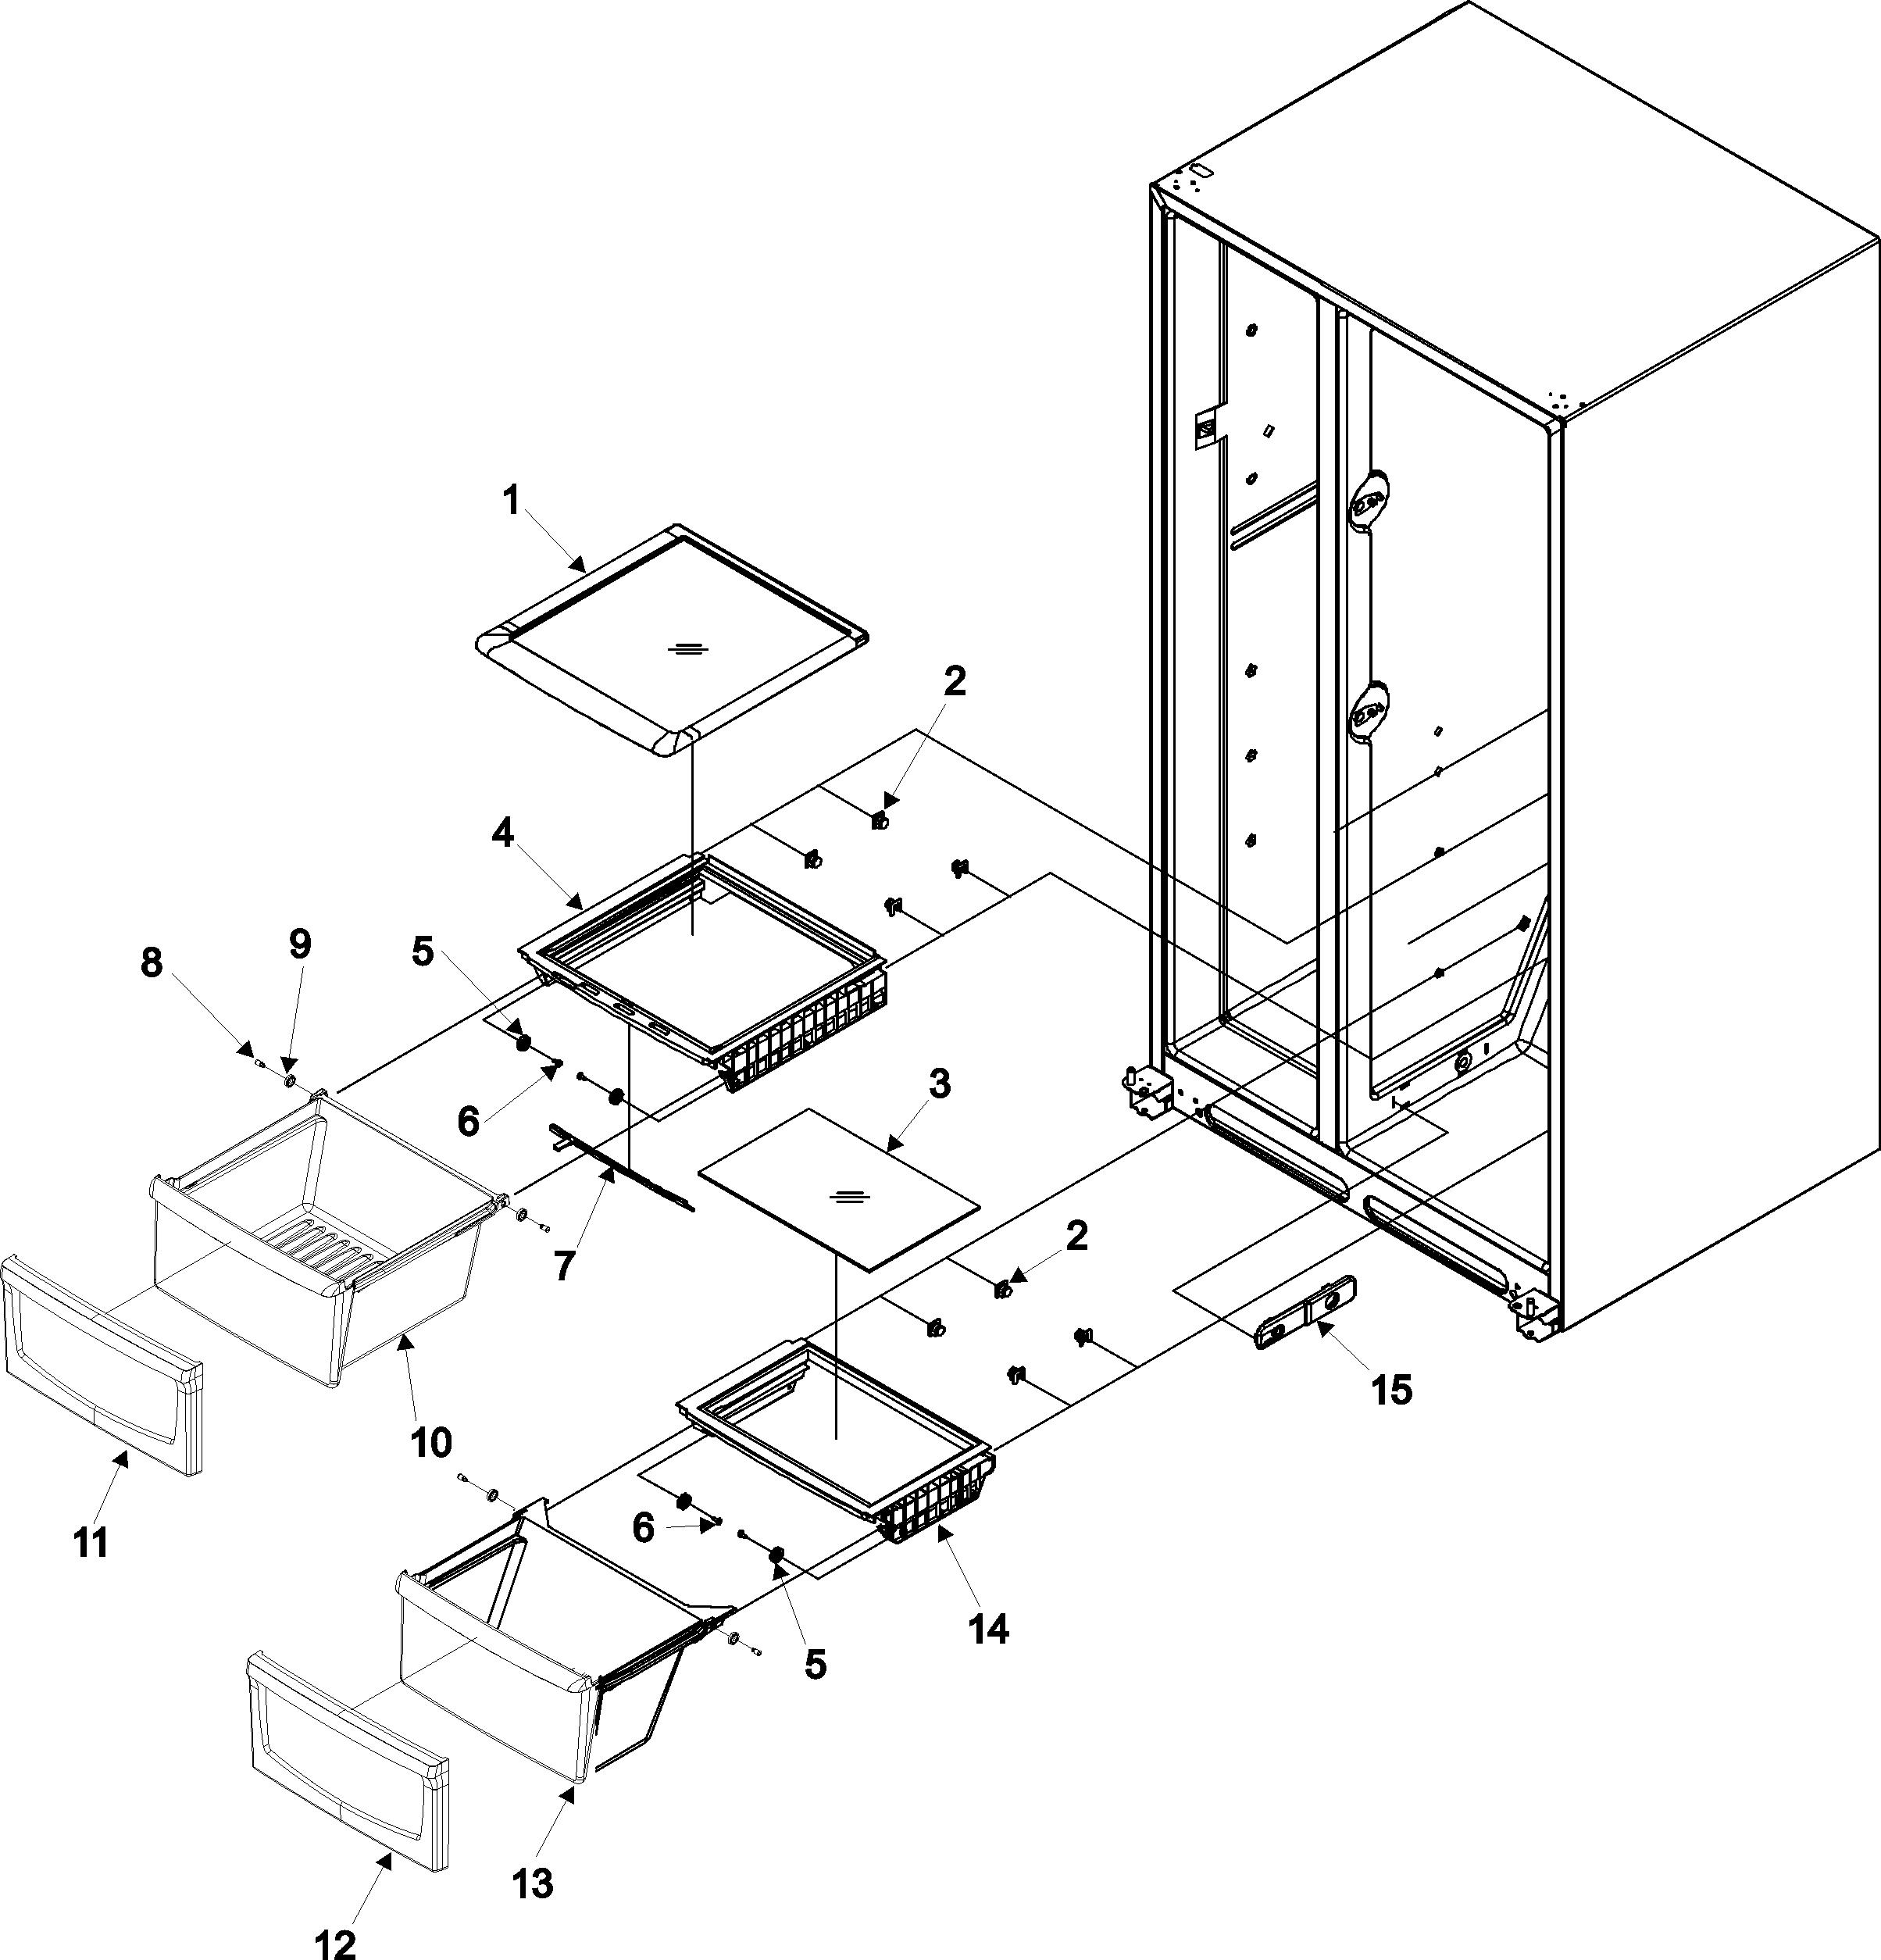 Amana model ASD2626HEW side-by-side refrigerator genuine parts